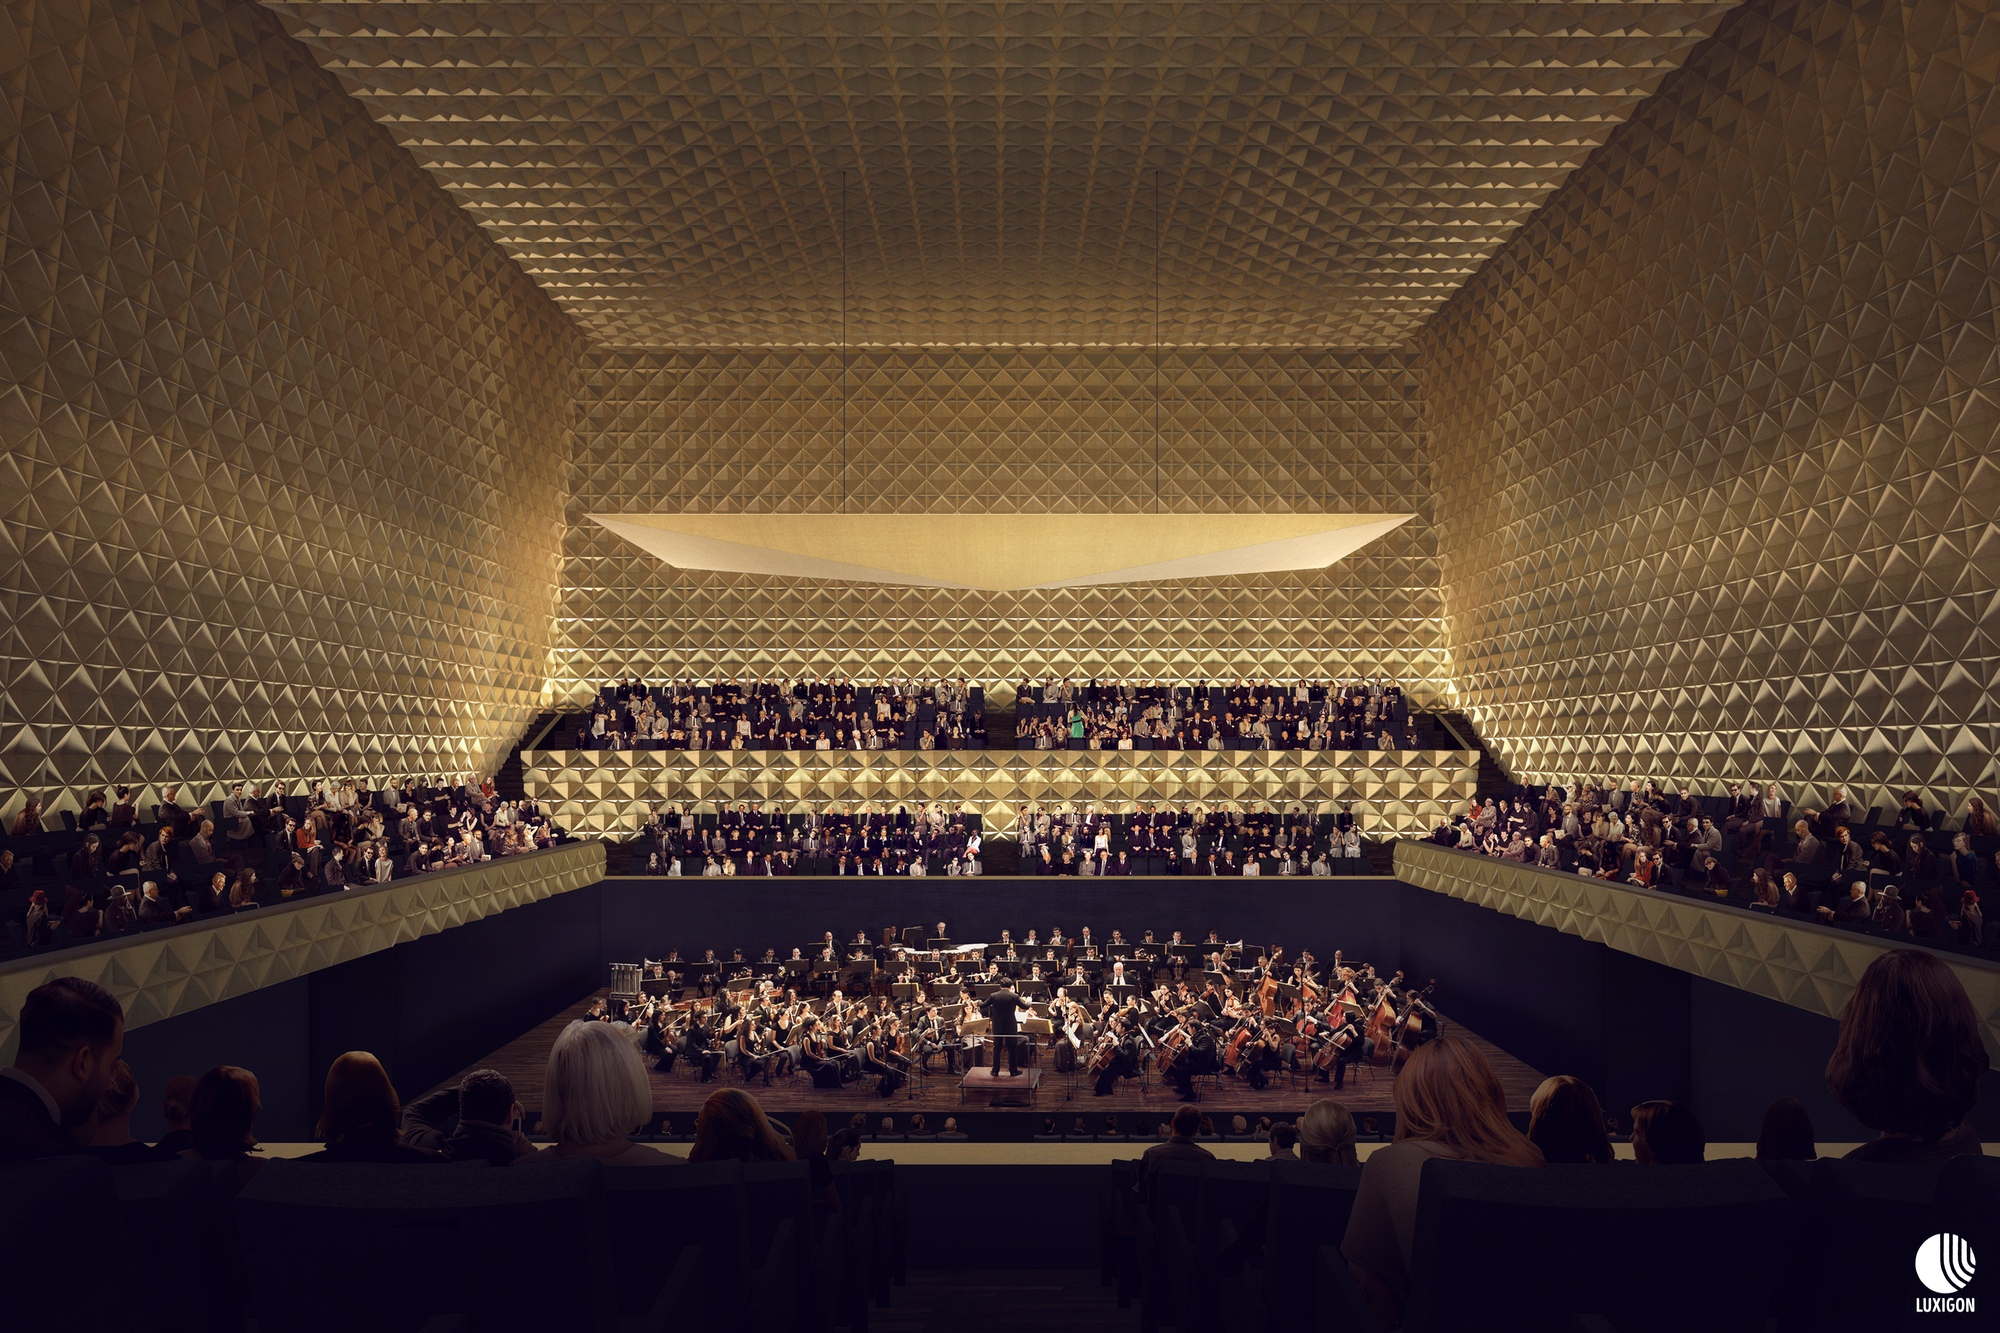 BAROZZI / VEIGA - Concert All - Munich, DE